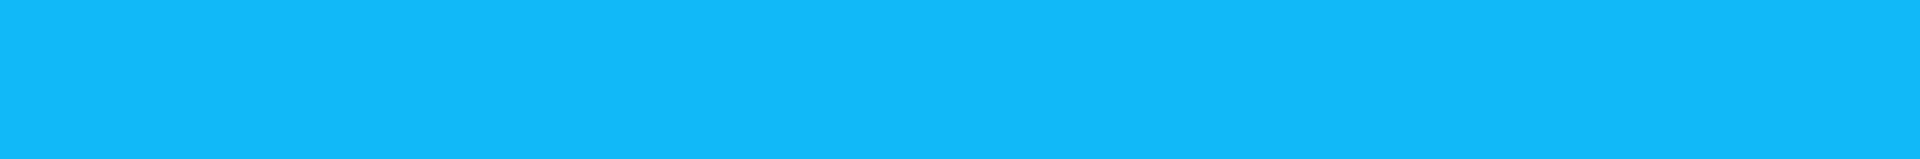 obrázek patička